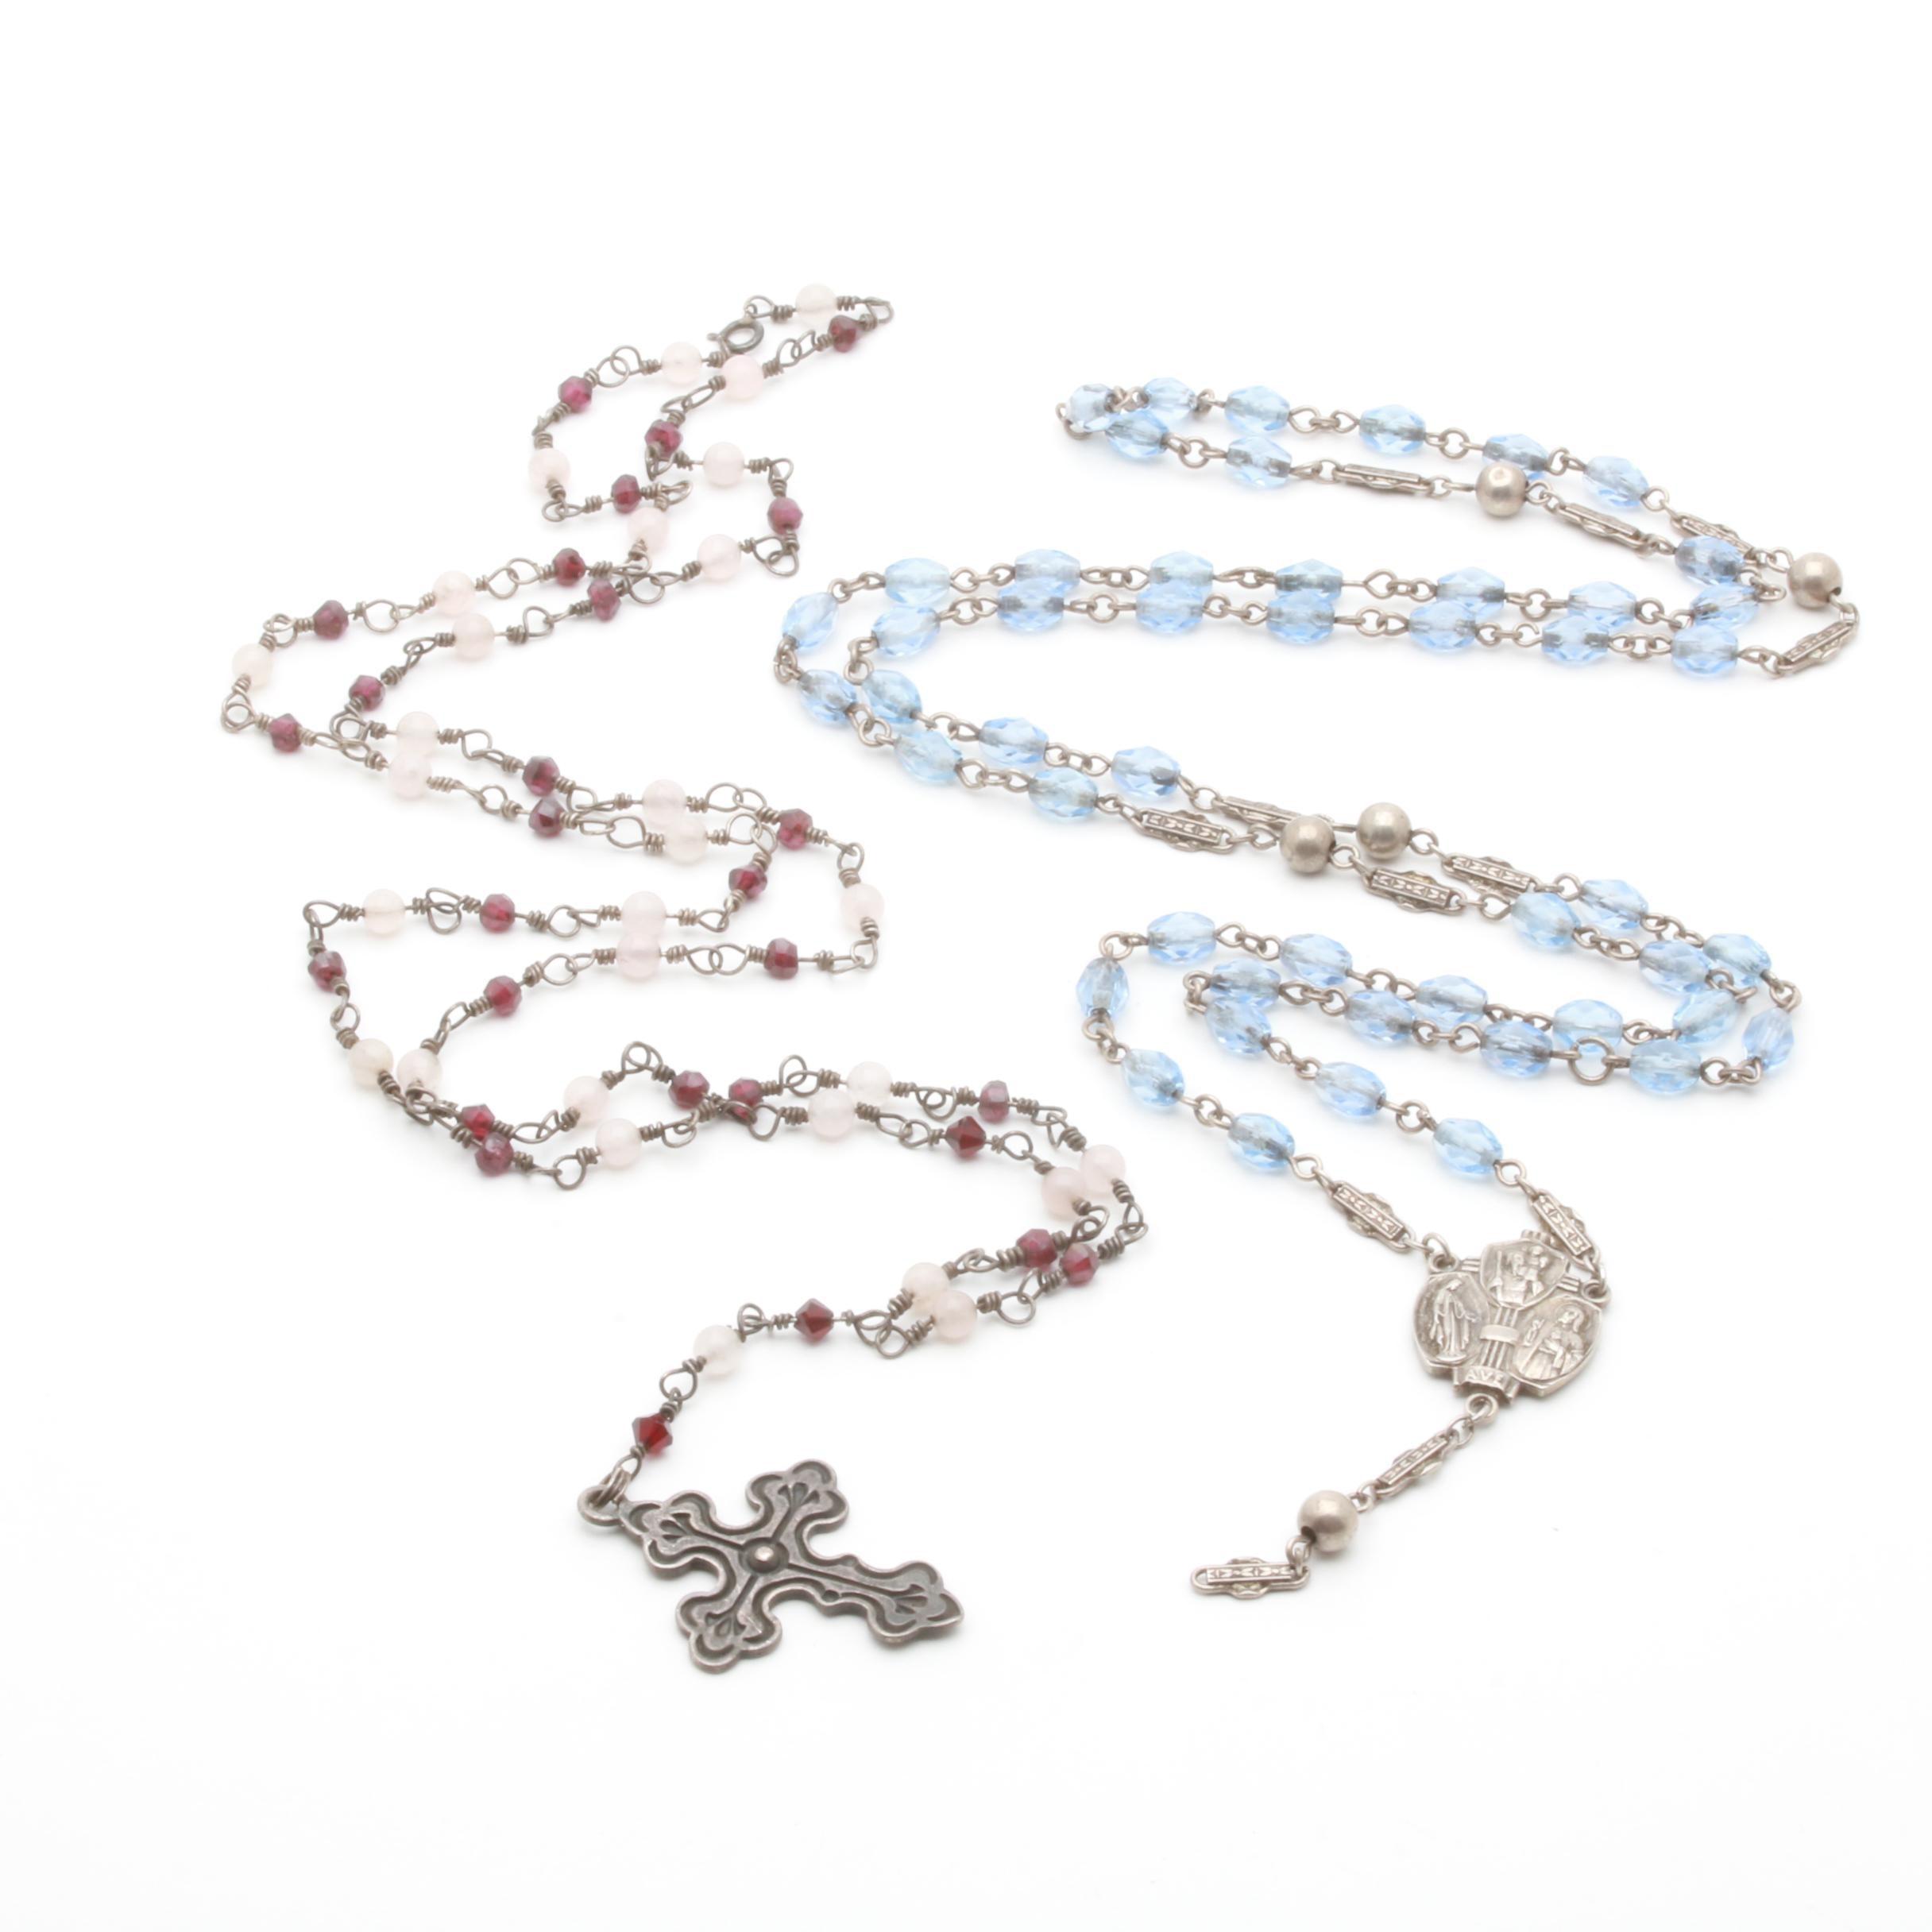 Sterling Silver Rose Quartz, Garnet and Glass Rosaries